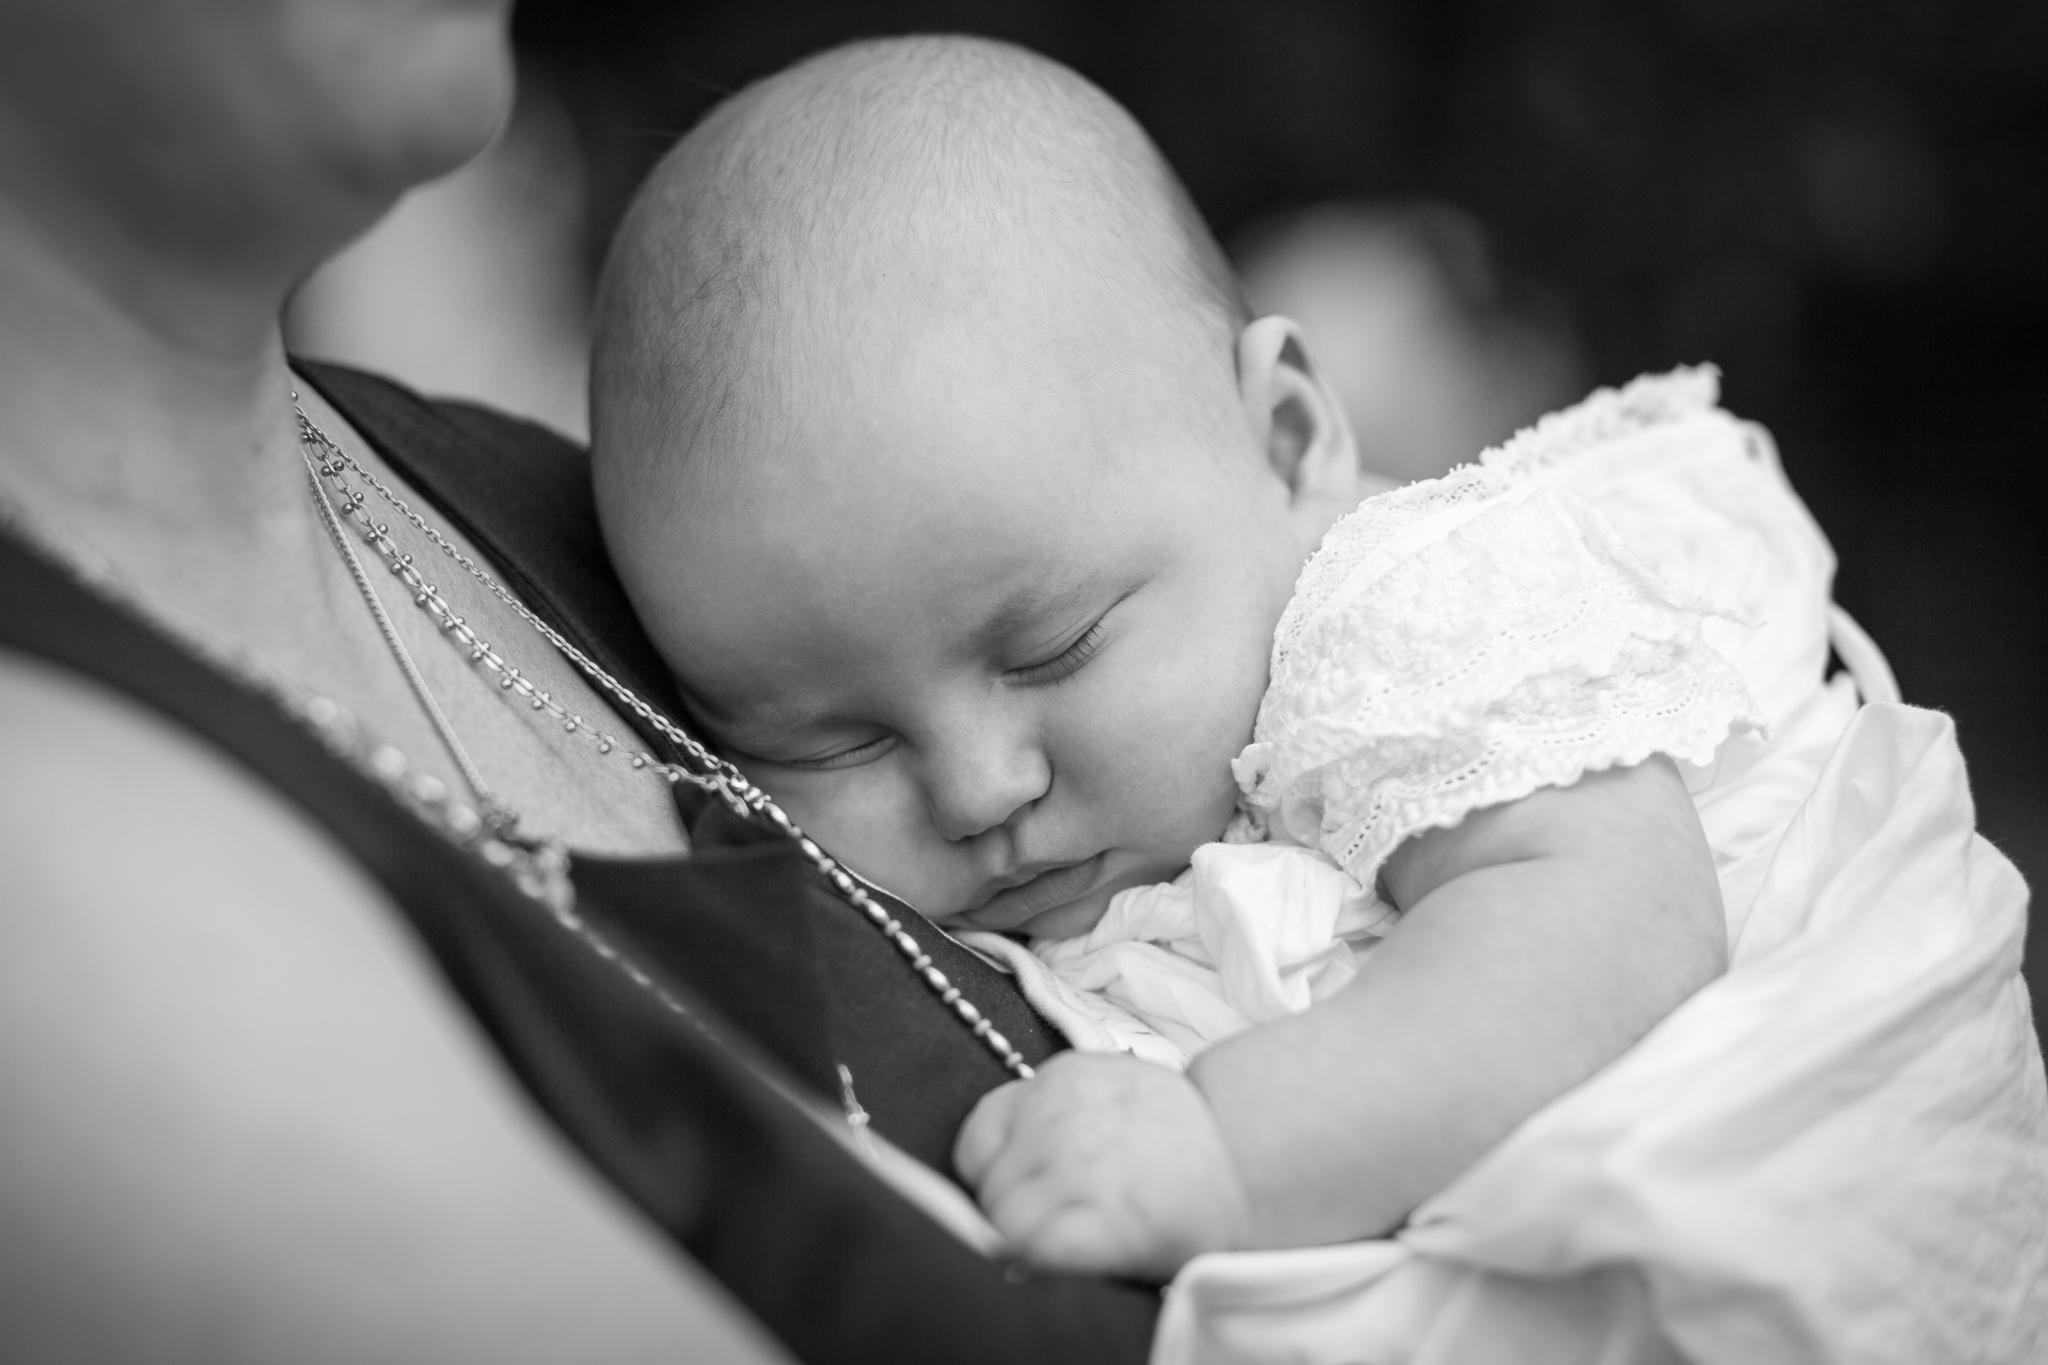 baby sleeping at christening.jpg